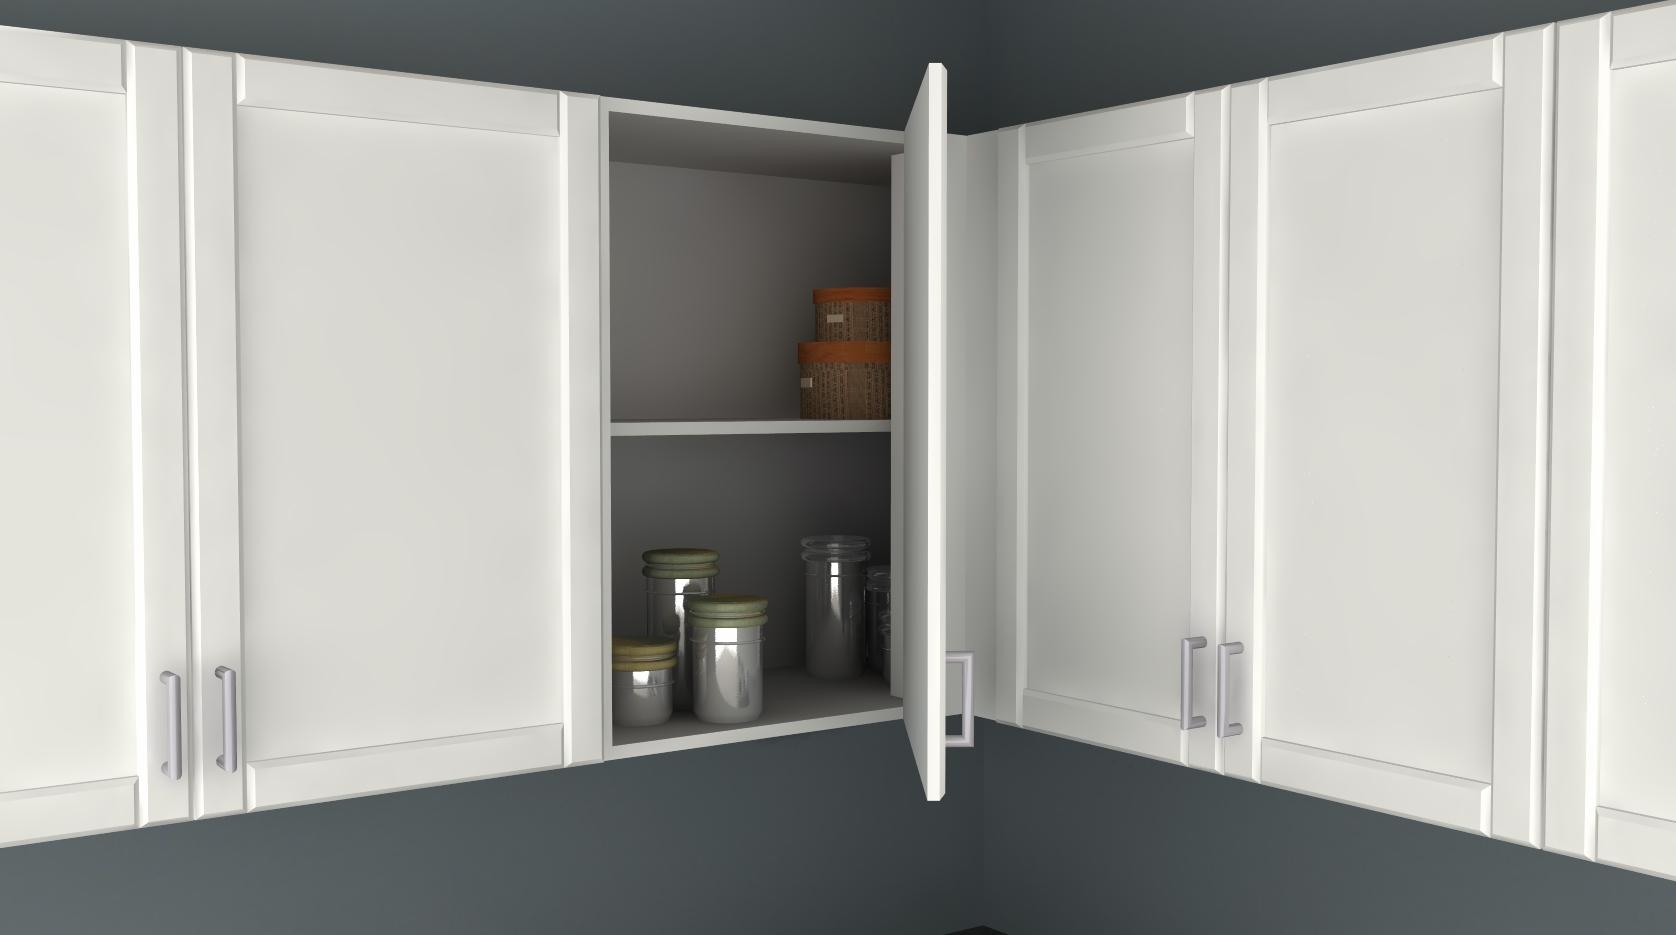 ikea kitchen hack blind corner wall cabinet kitchen cabinets ikea IKD ikea kitchen hack blind corner cabinet 1